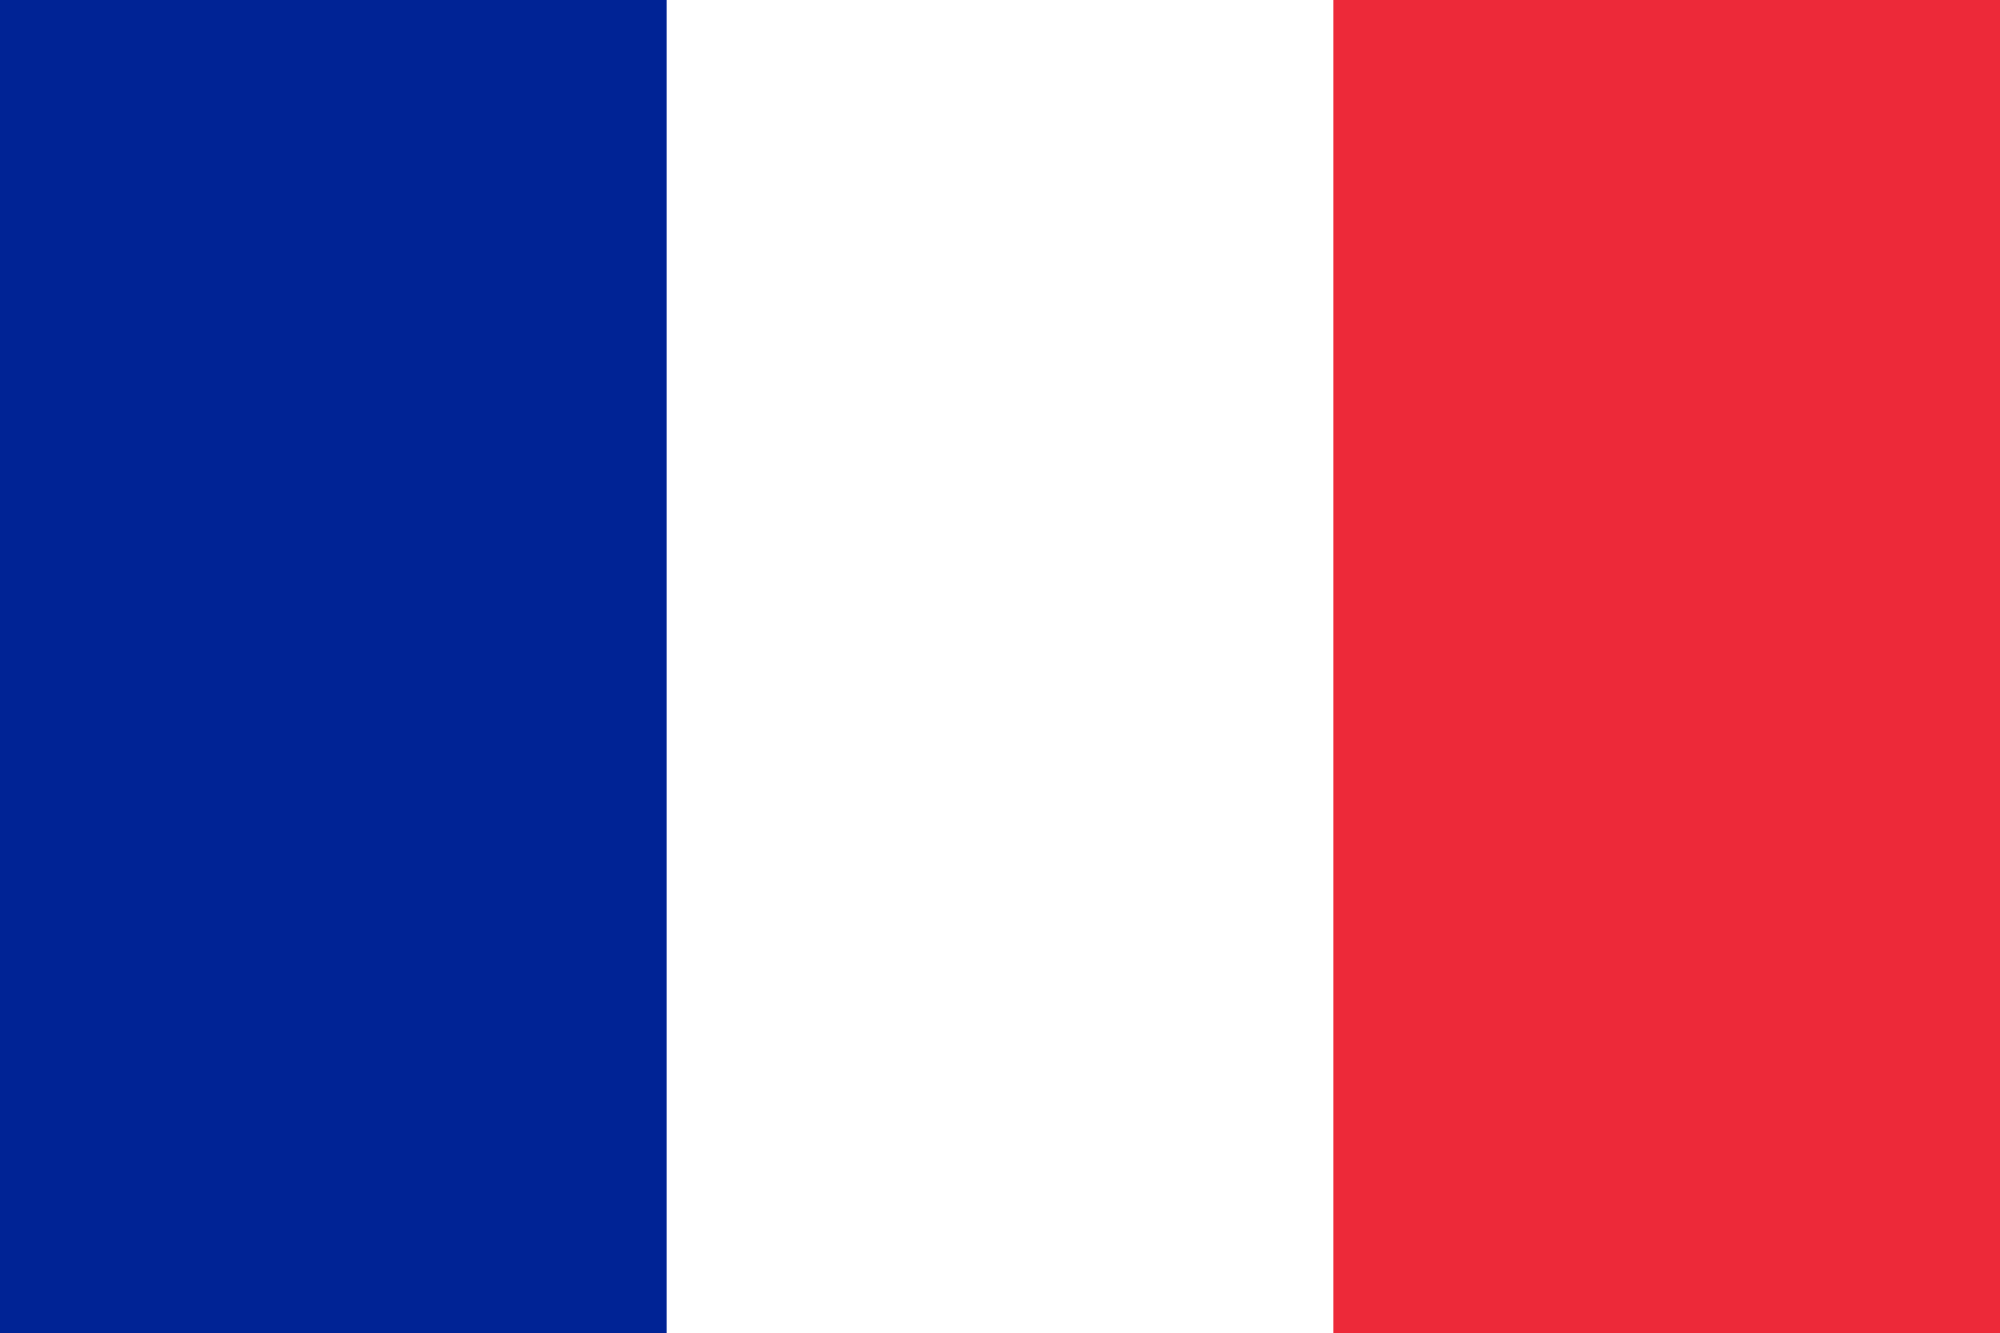 Bandera francia for Republica francesa wikipedia